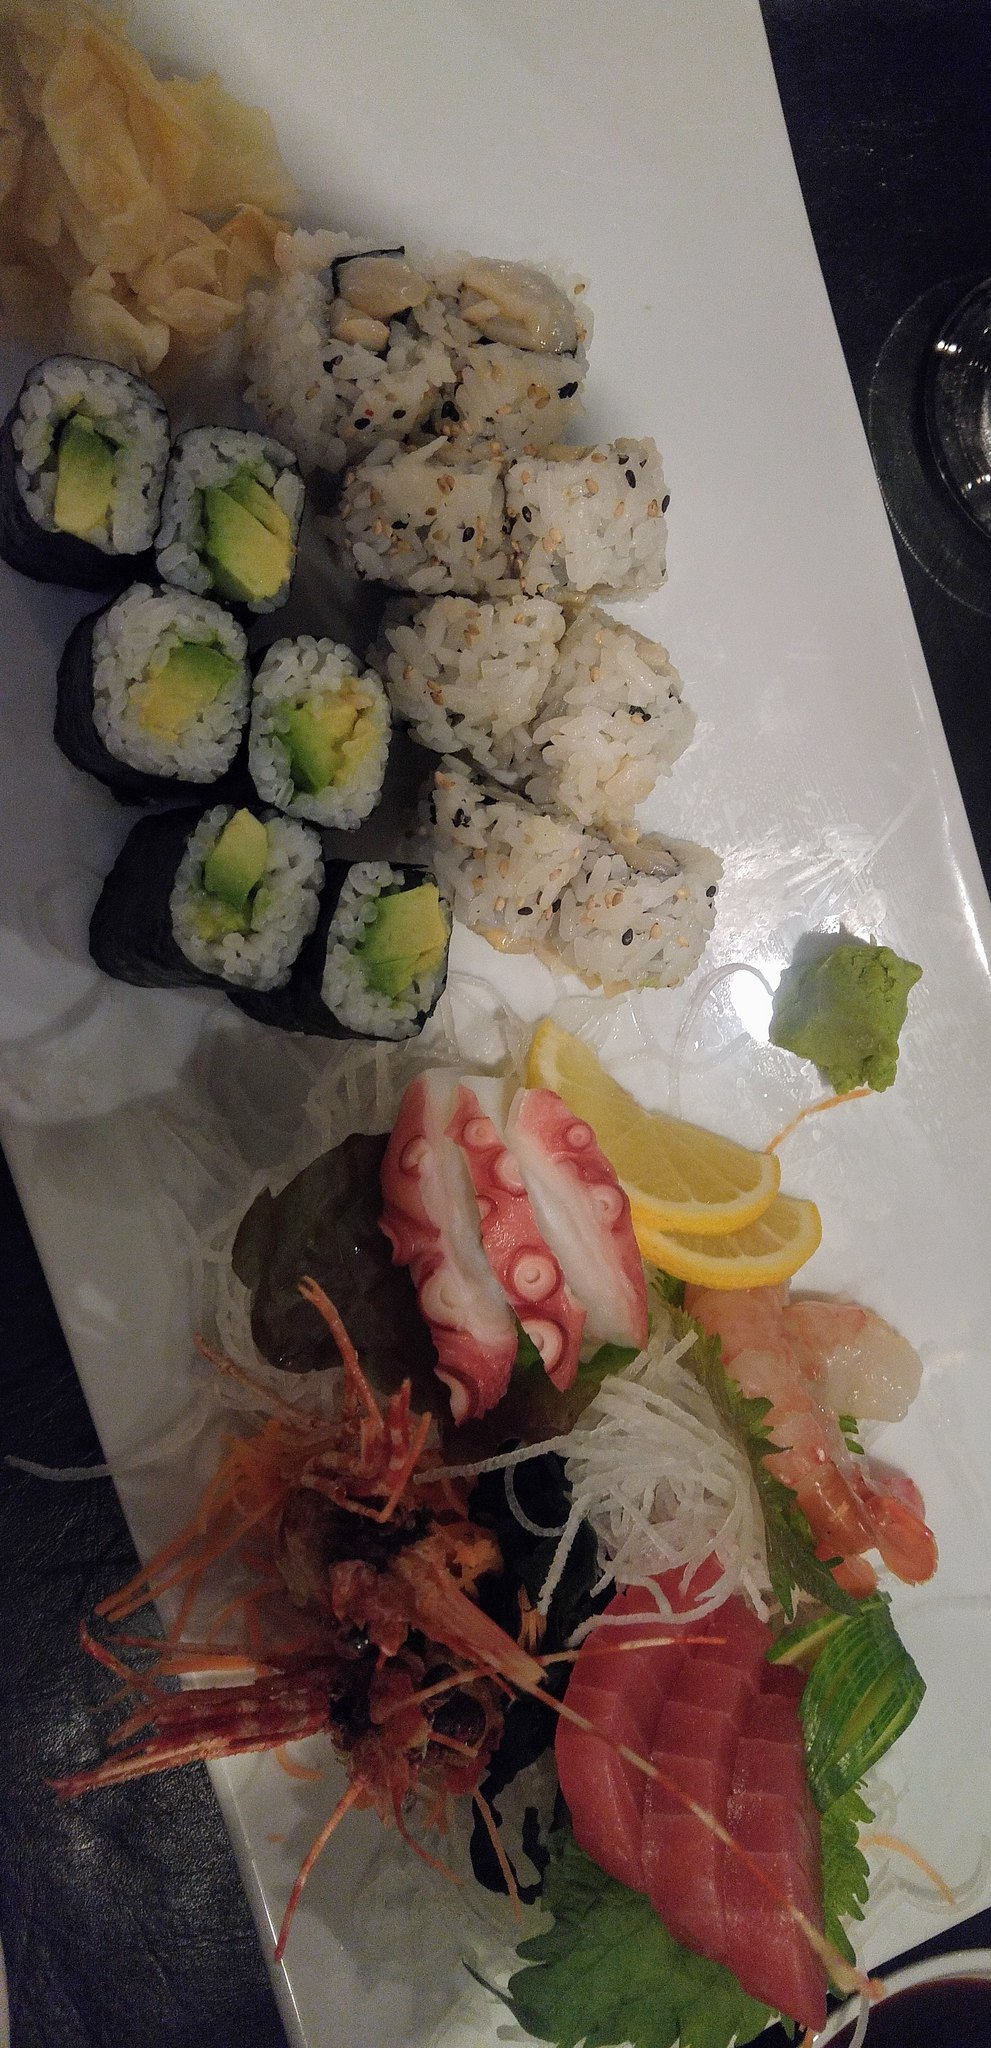 Sushi Yasu cuisine japonaise bouffe aliments nourriture restaurant asiatique